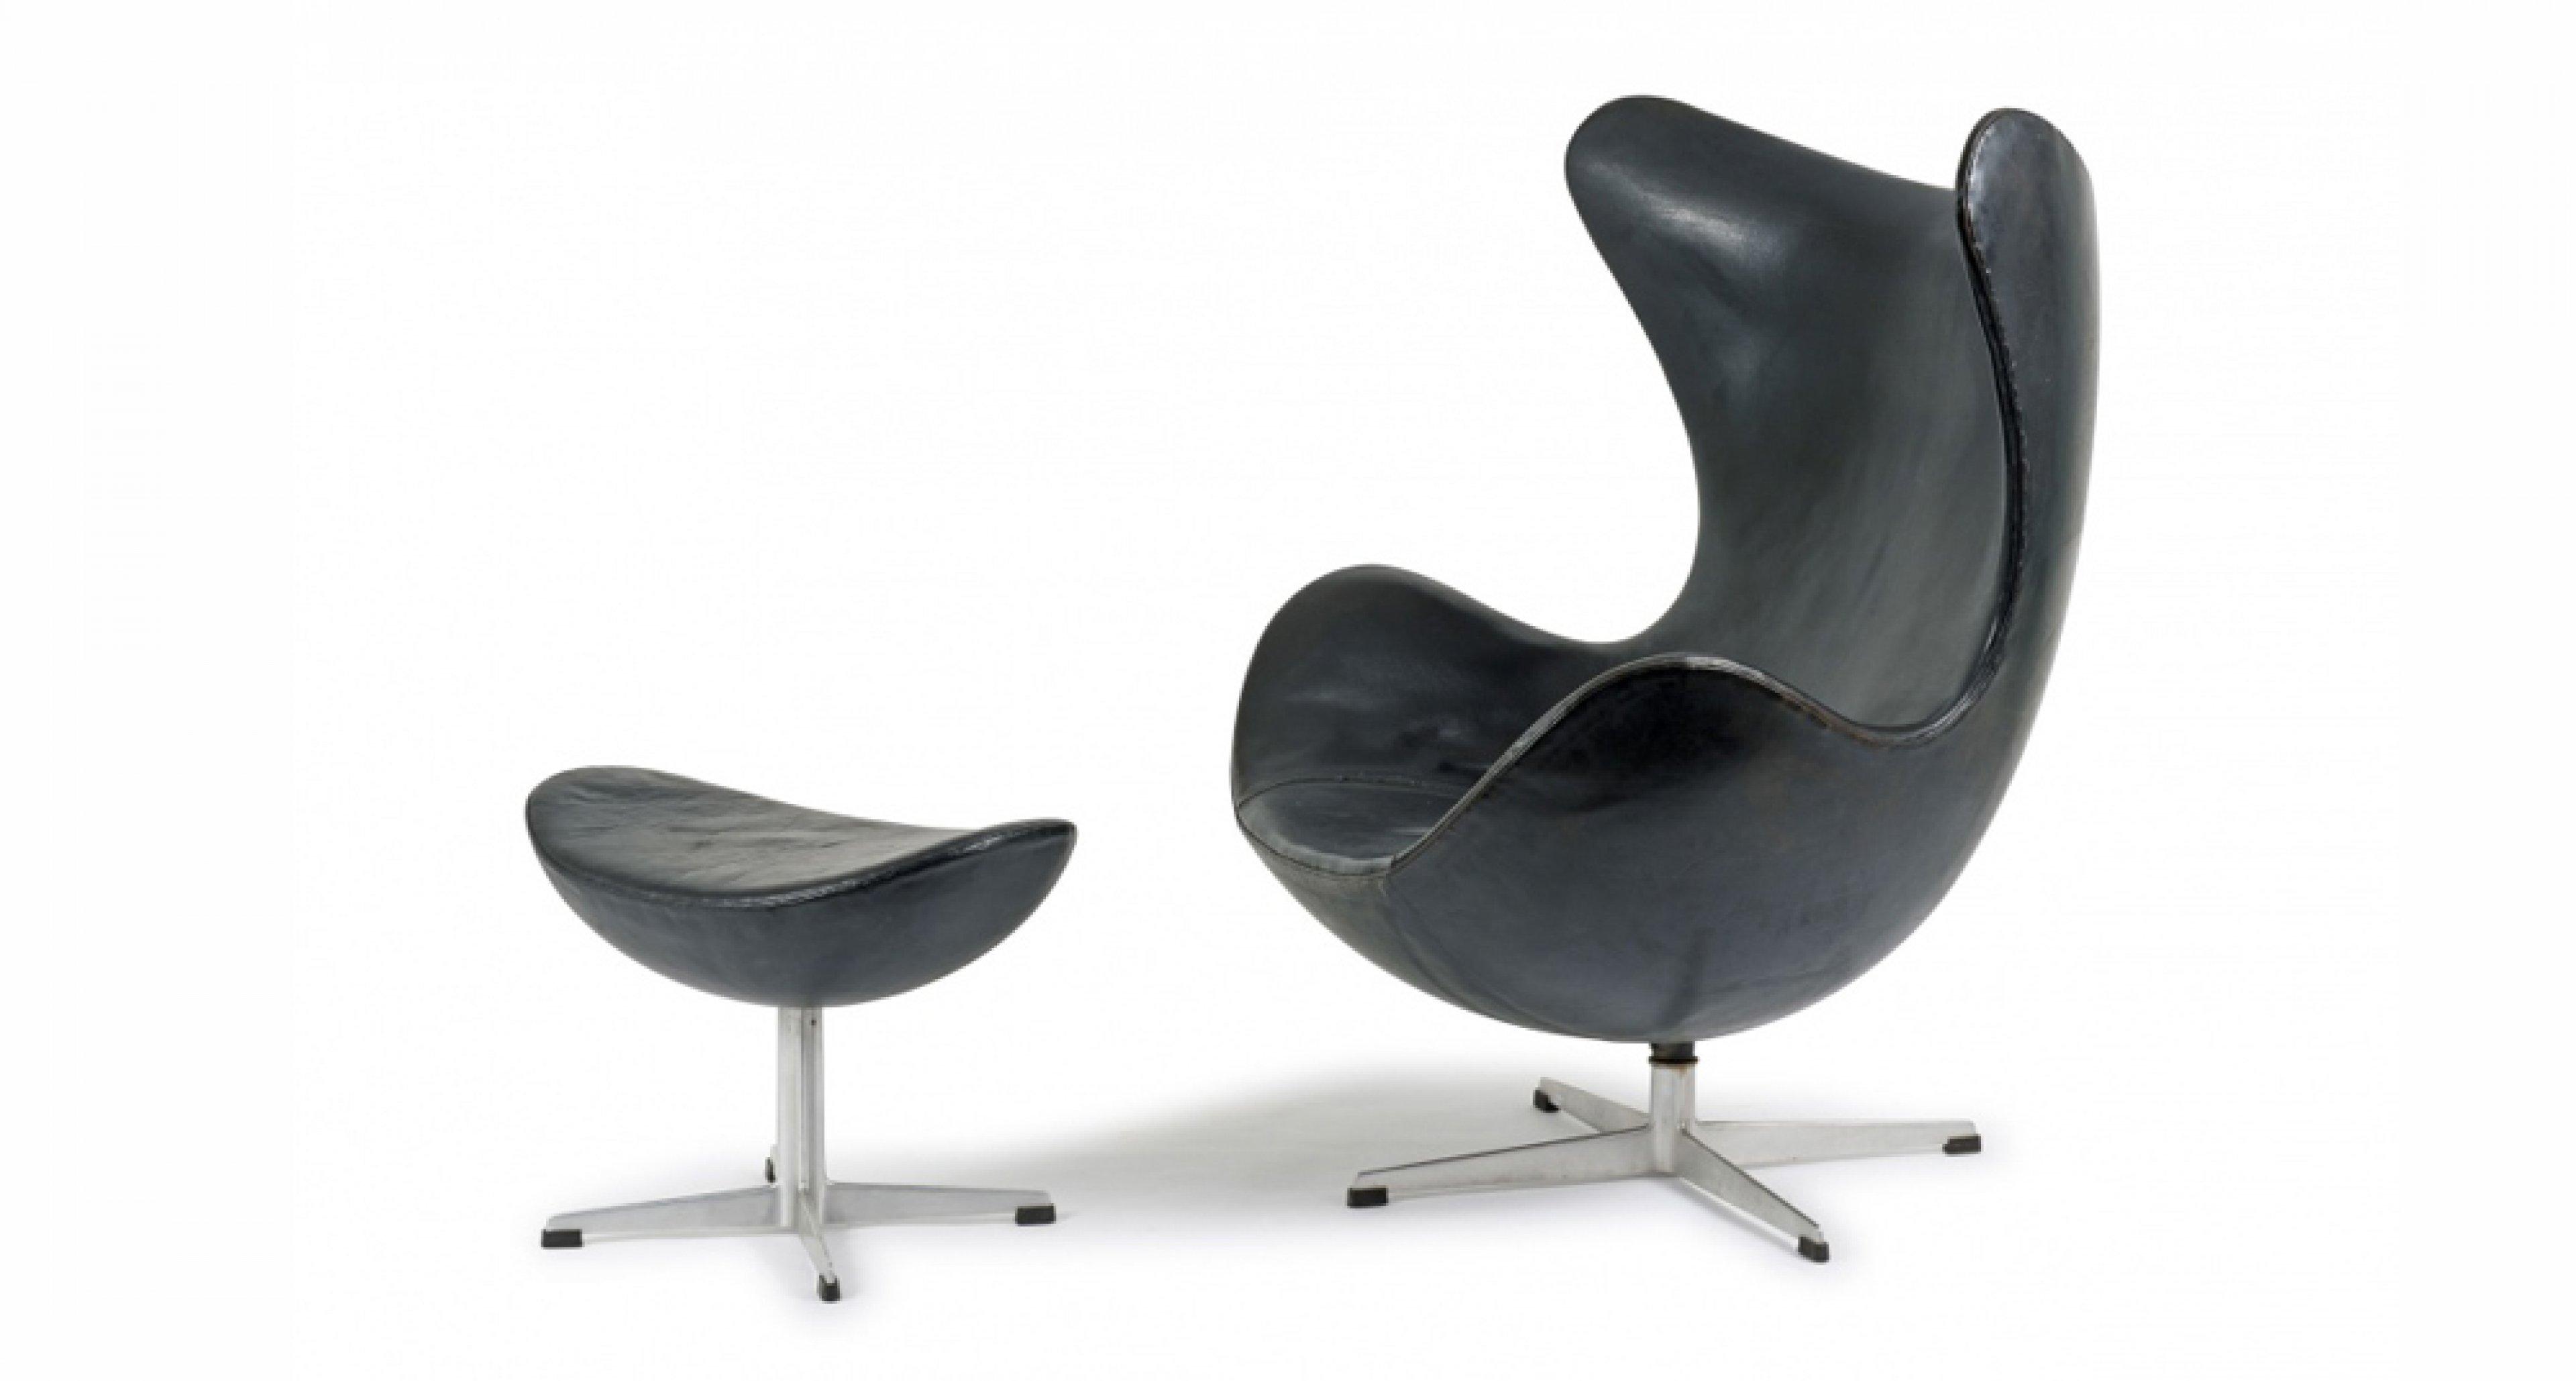 furniture design classics. furniture design classics n